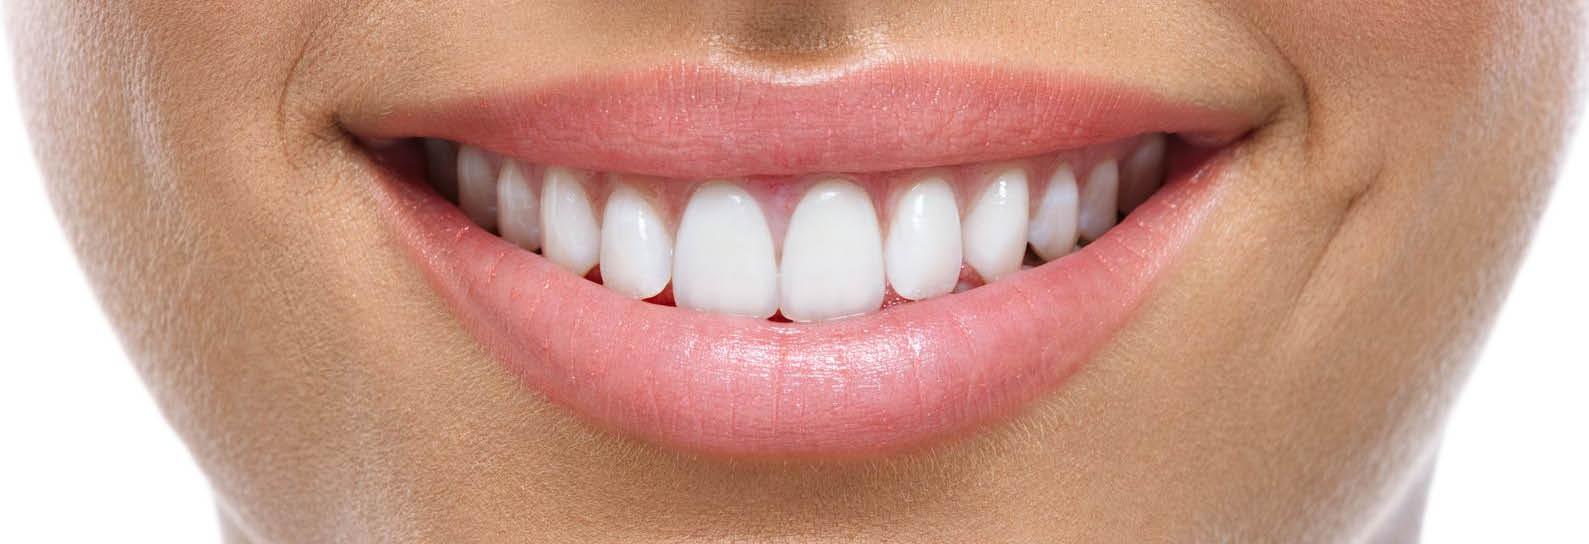 model dental smile photo